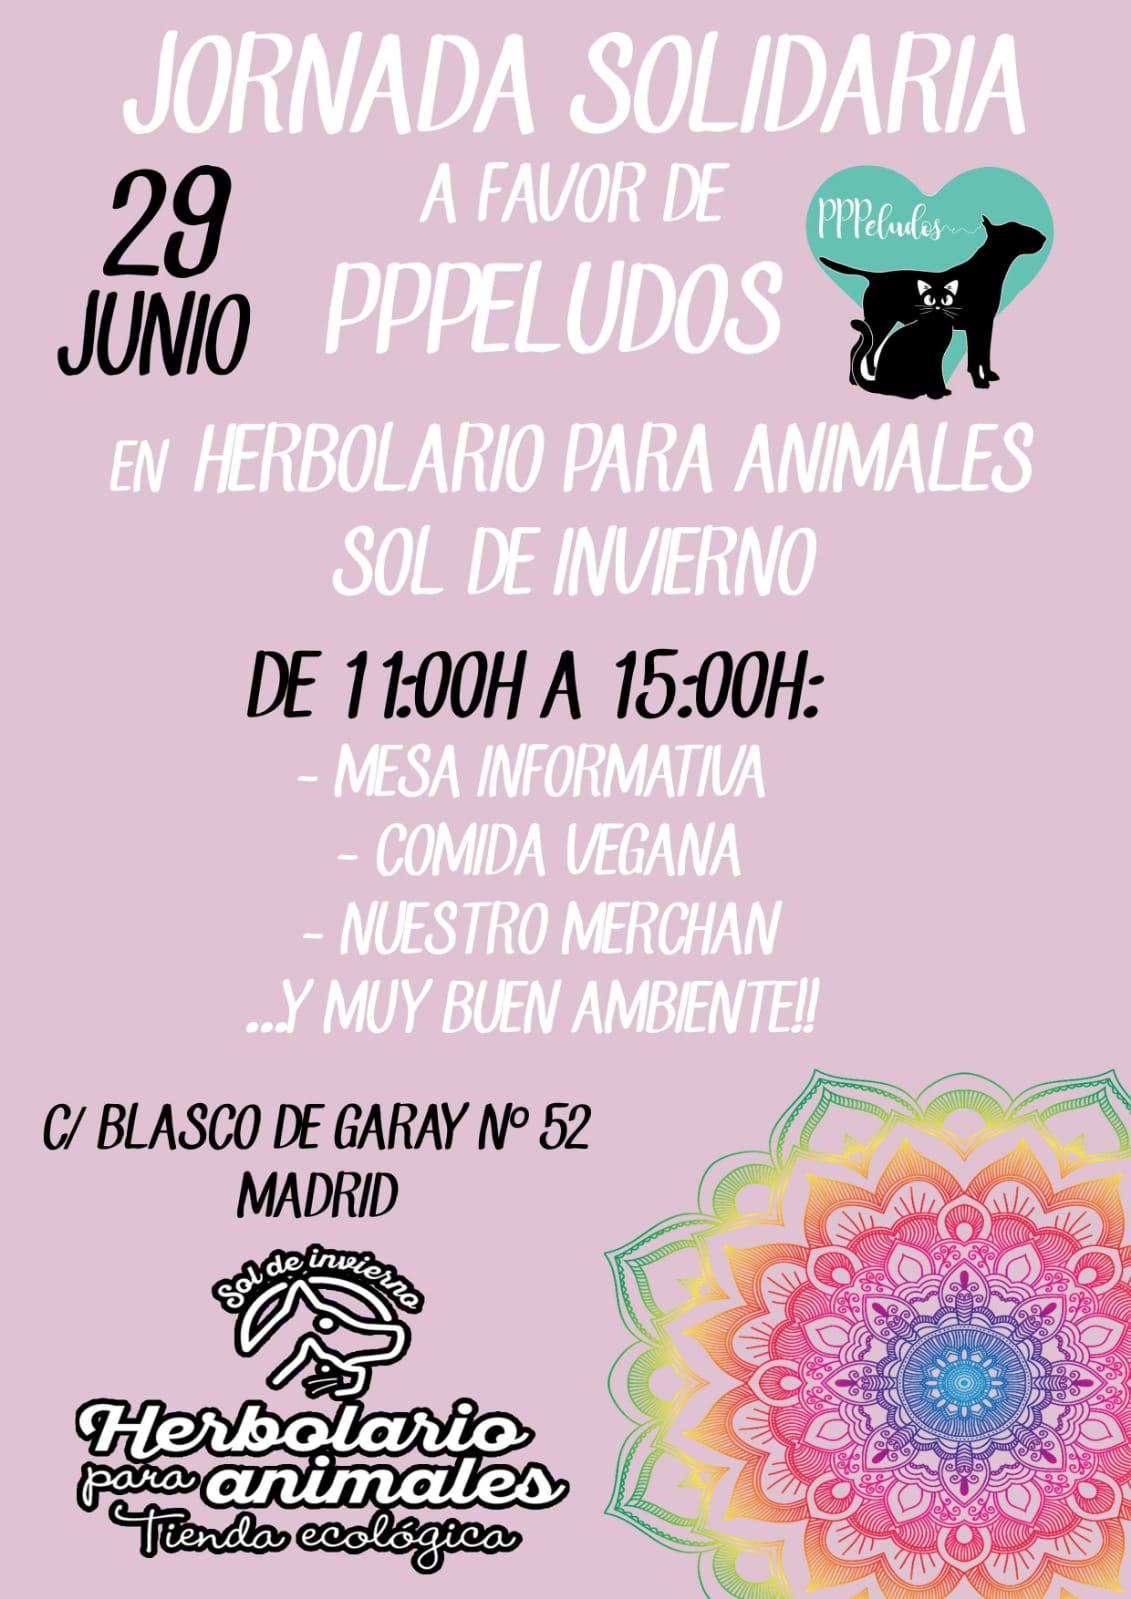 Jornada solidaria a favor de PPPeludos